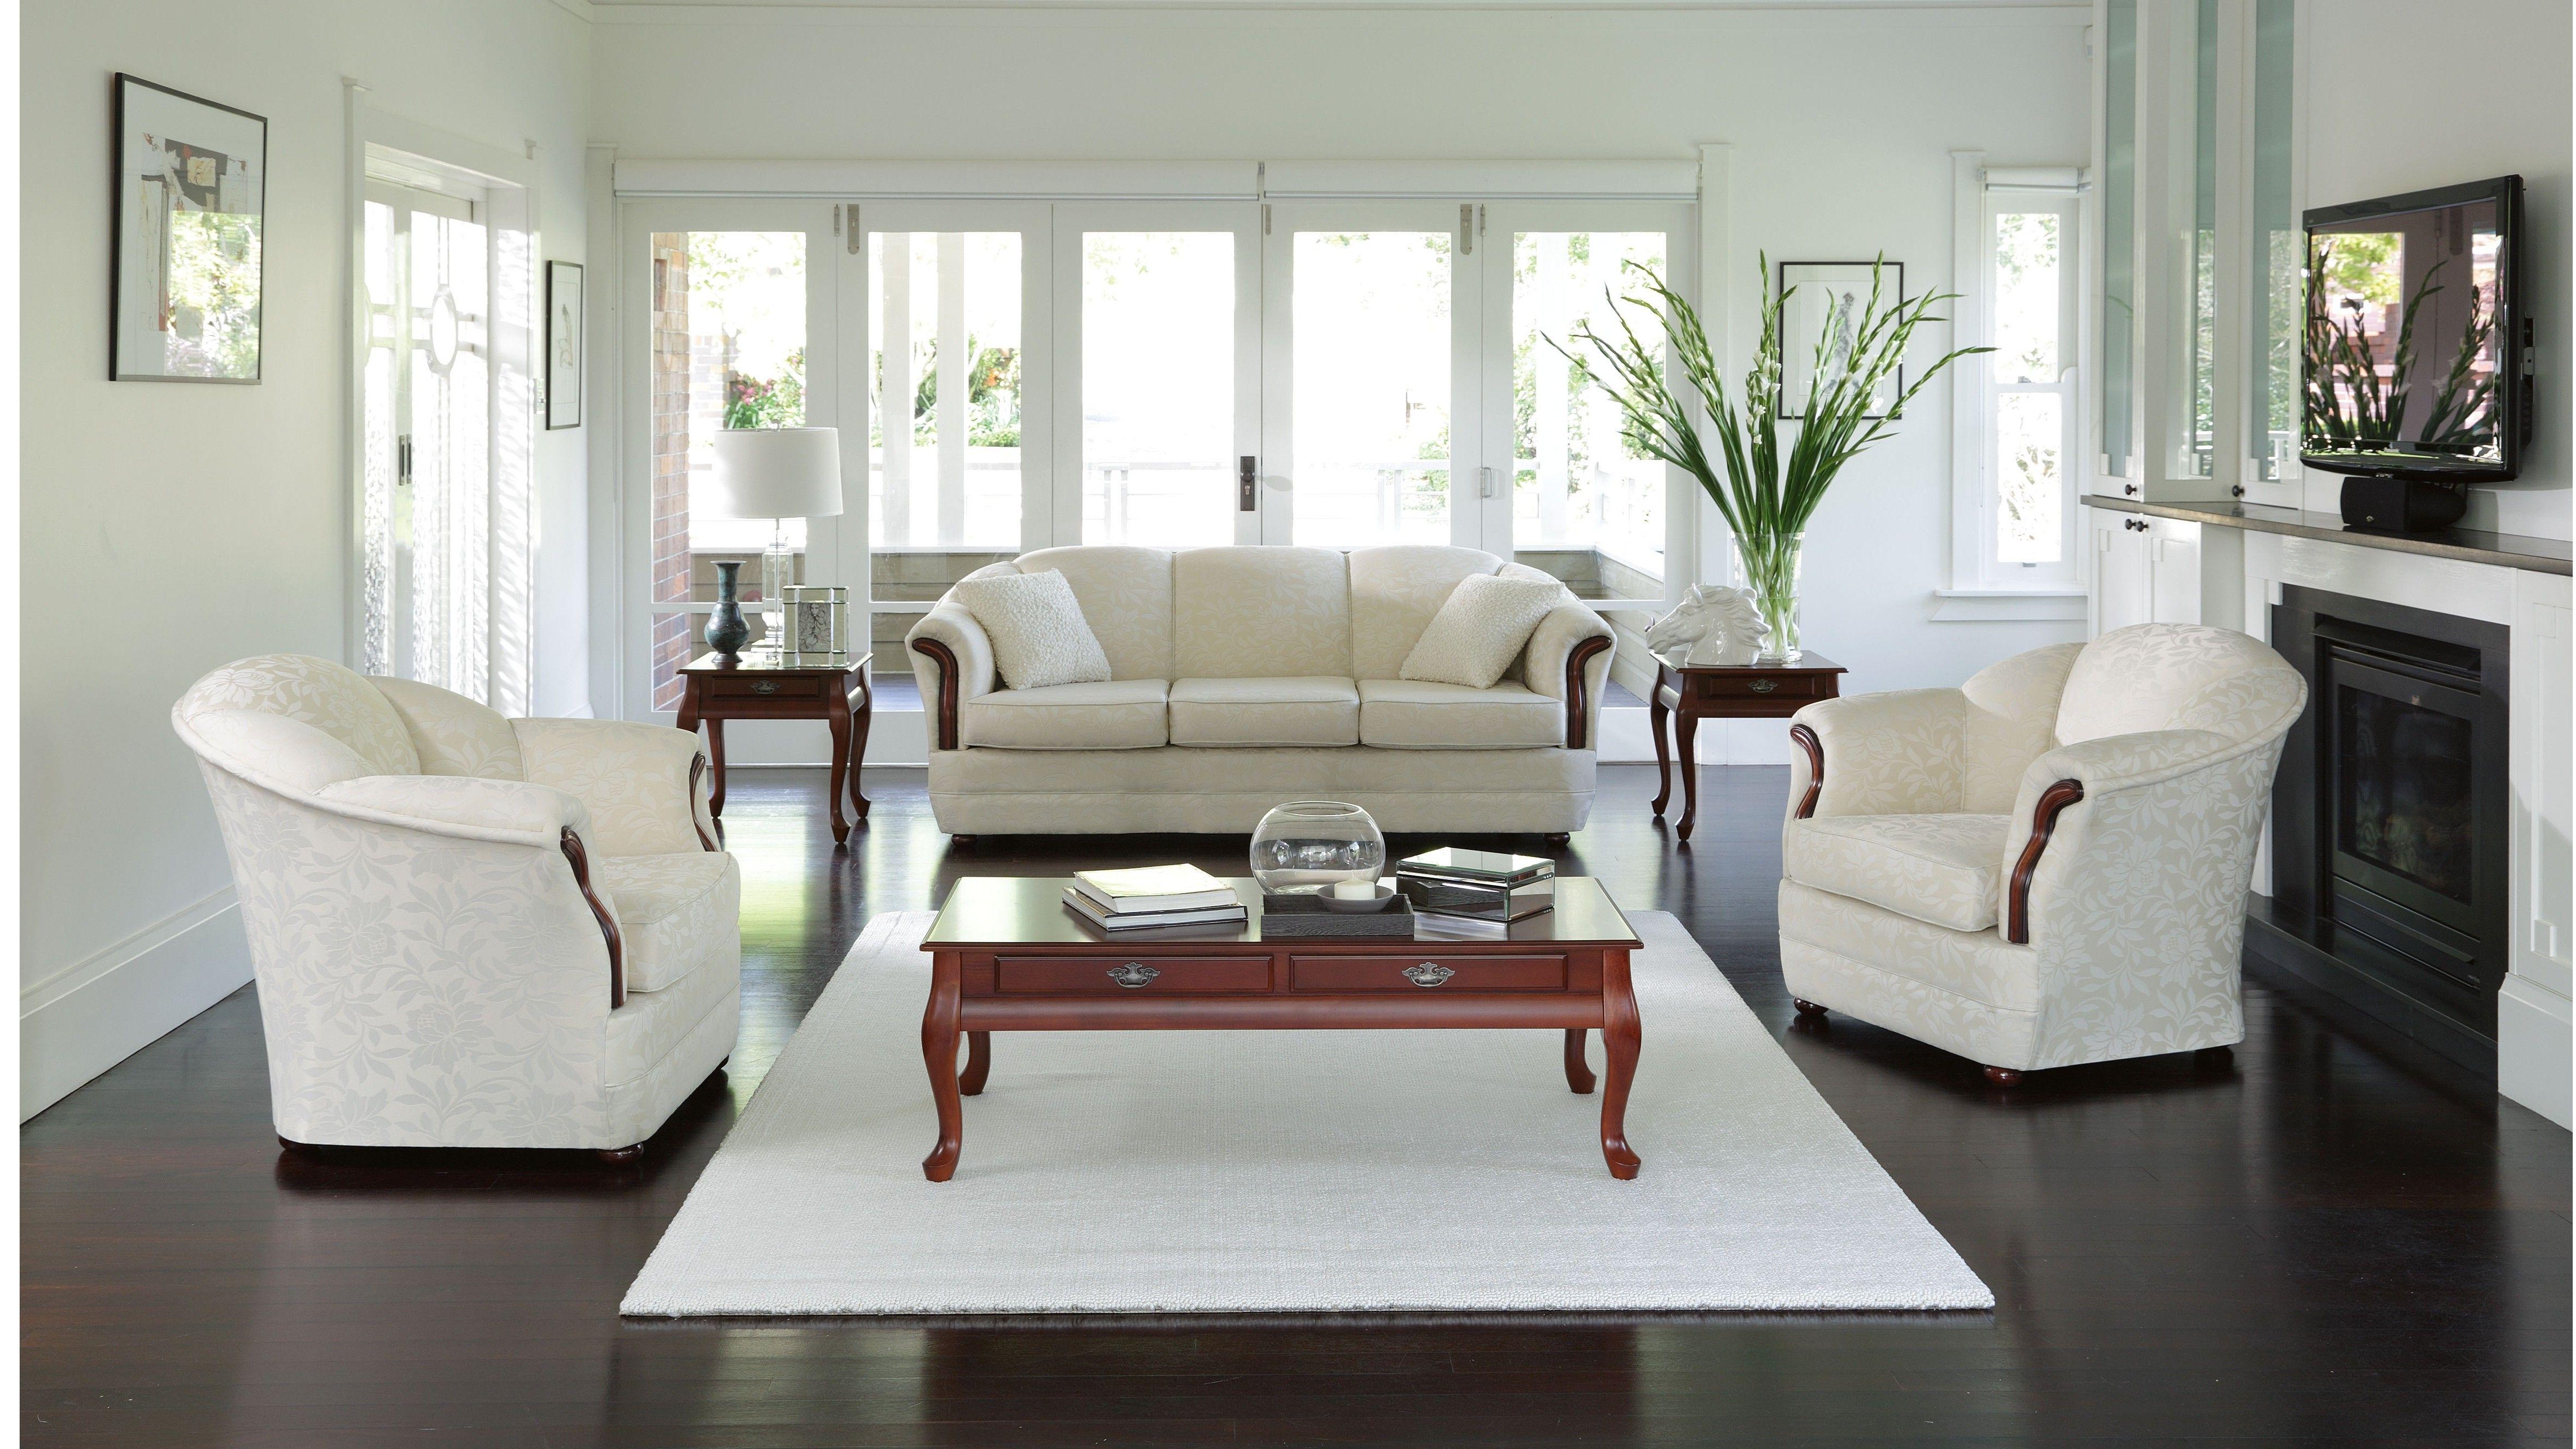 Seashell 3 Piece Fabric Lounge Suite | Home Design/Decor | Pinterest ...